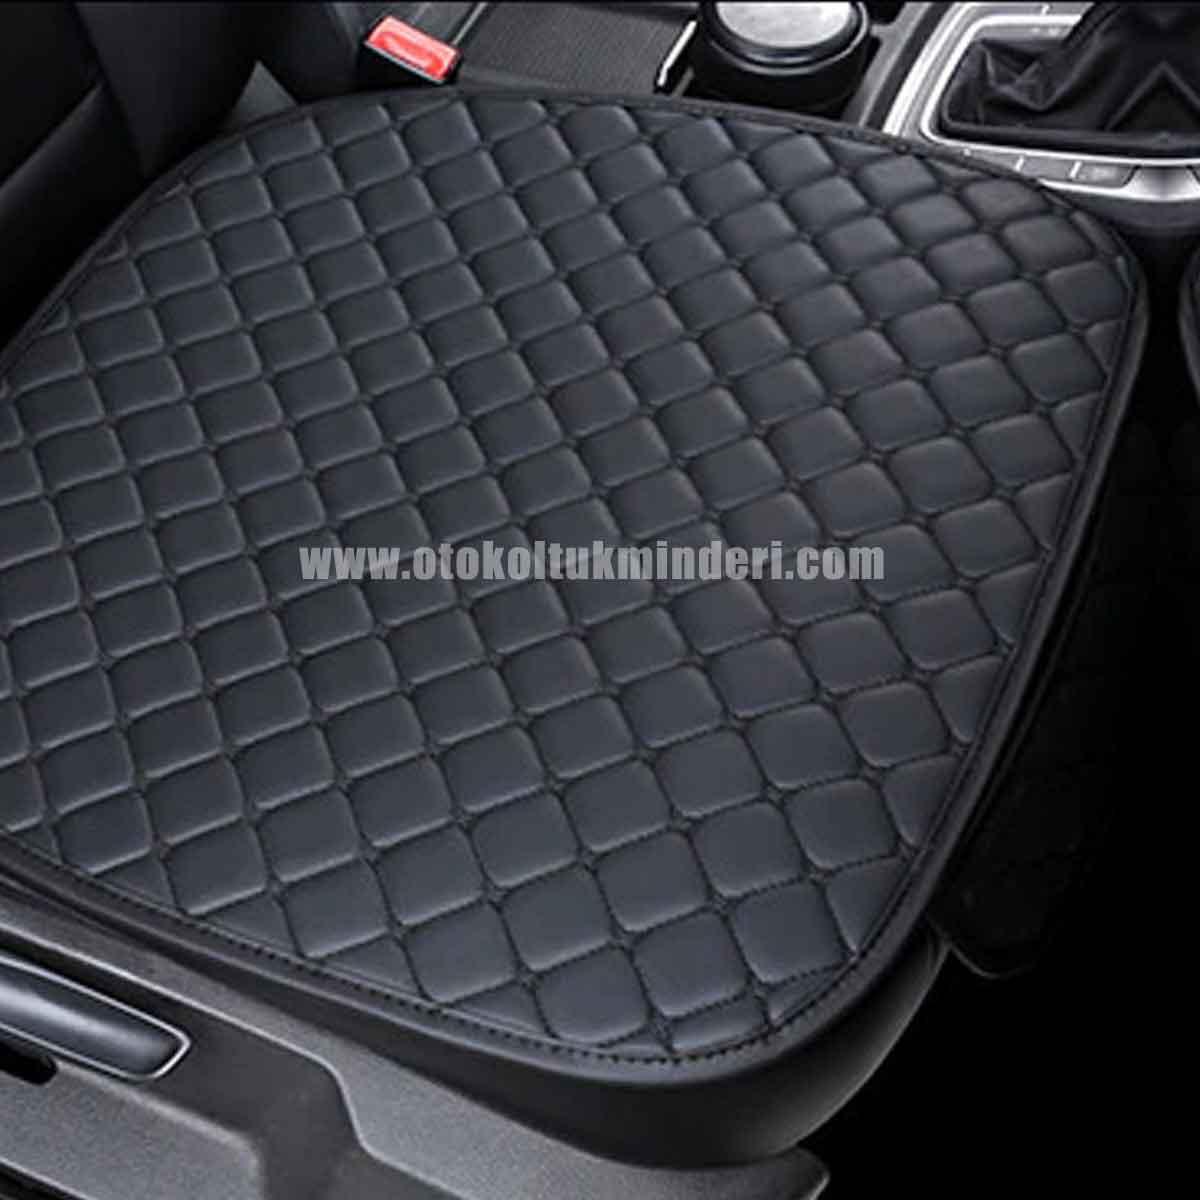 Jeep oto koltuk kılıfı - Jeep Koltuk minderi Siyah Deri Cepli